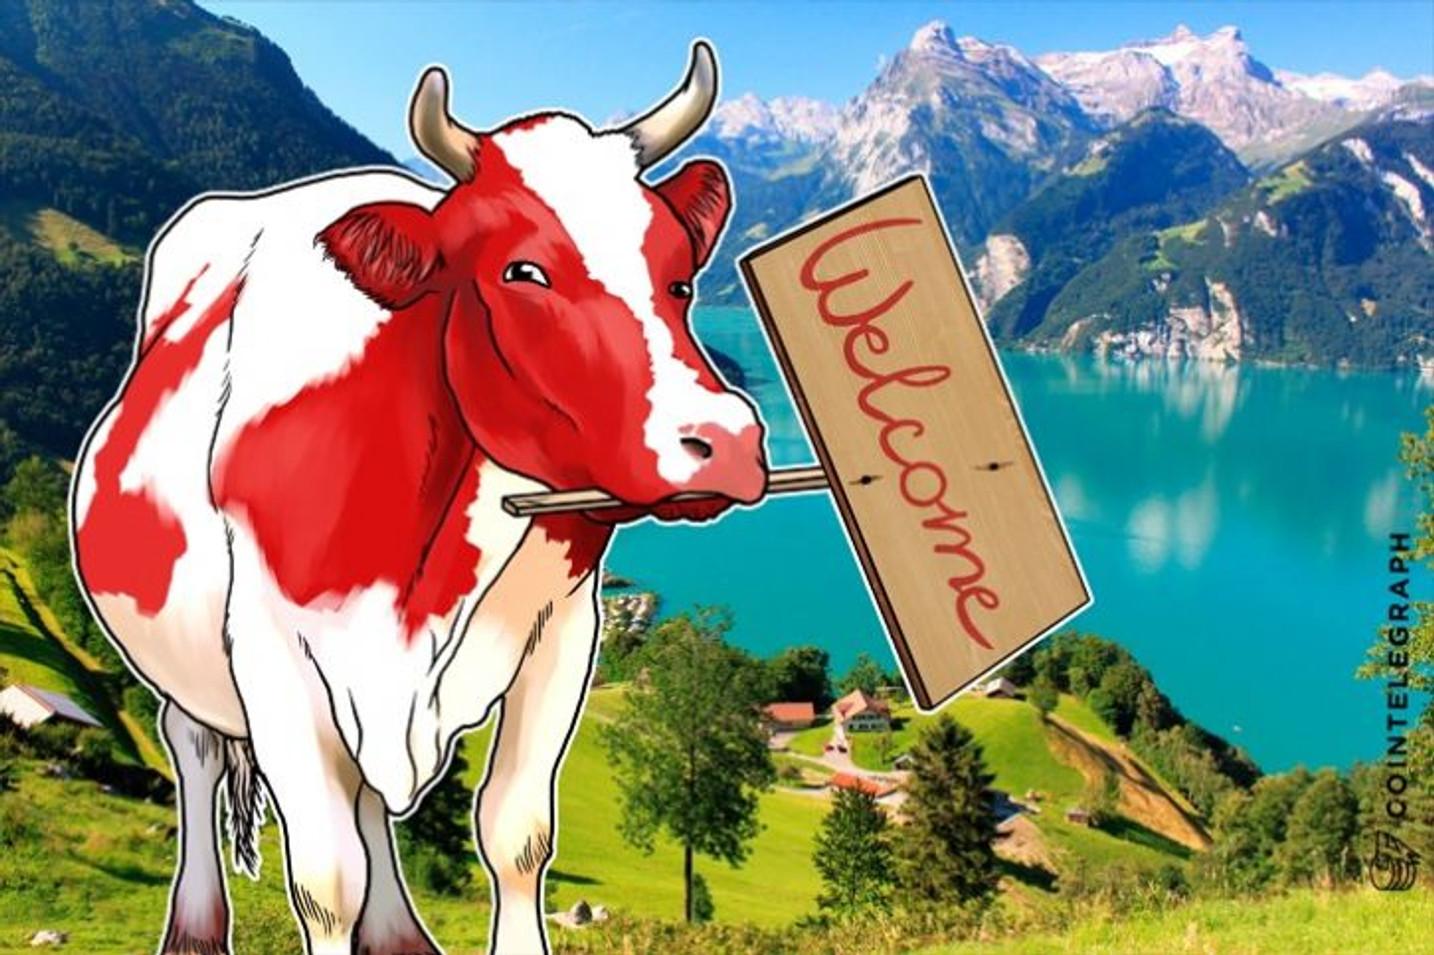 Swiss Regulators Investigating ICOs, Still Support Blockchain